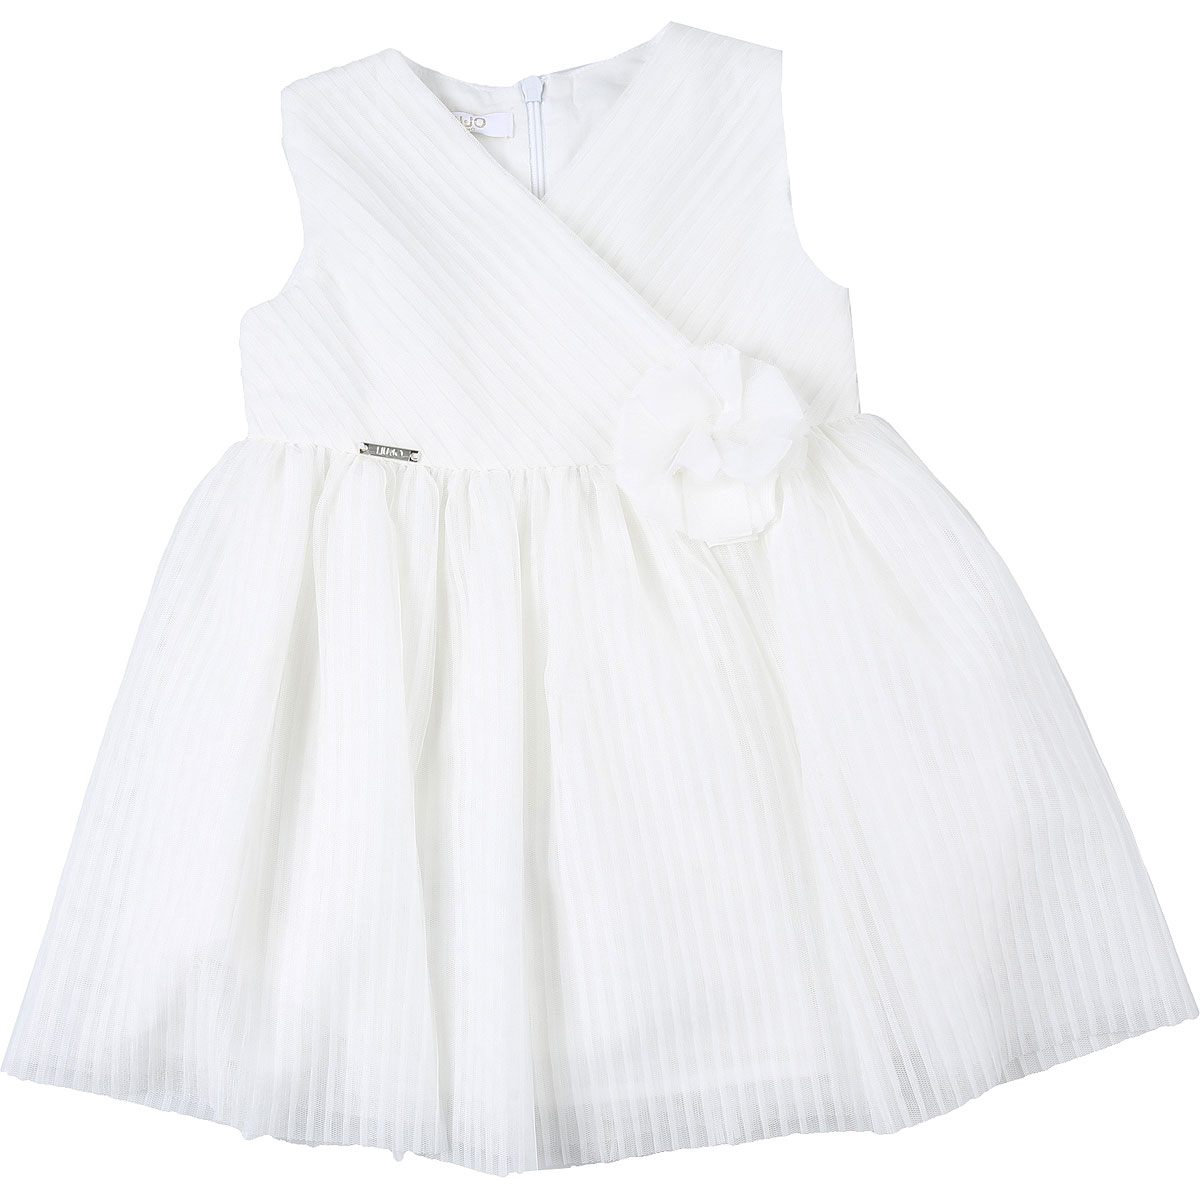 Liu Jo Baby Dress for Girls On Sale, White, polyester, 2019, 12M 18M 3M 6M